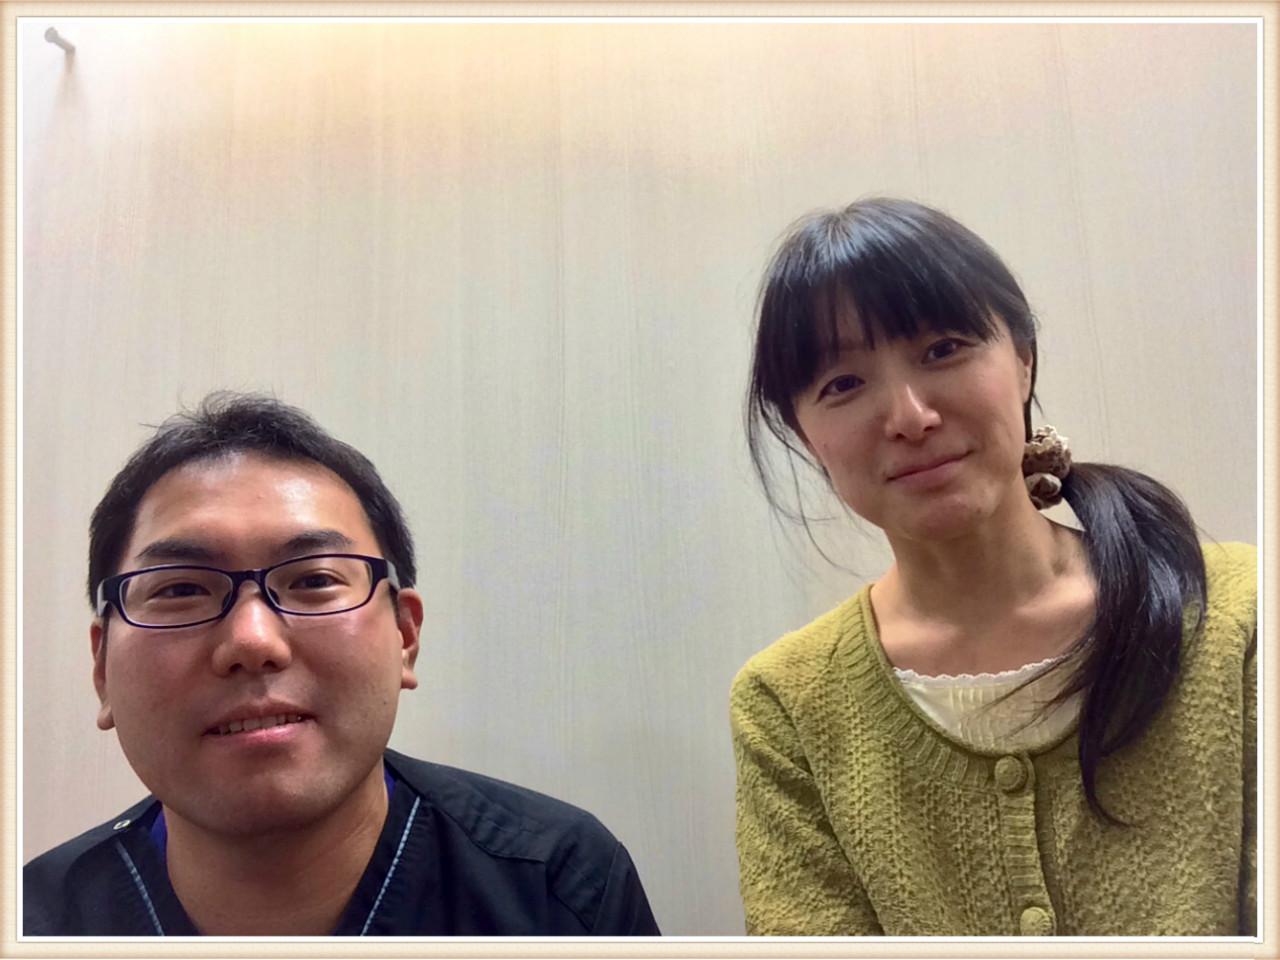 kawagoe S.H.jpg